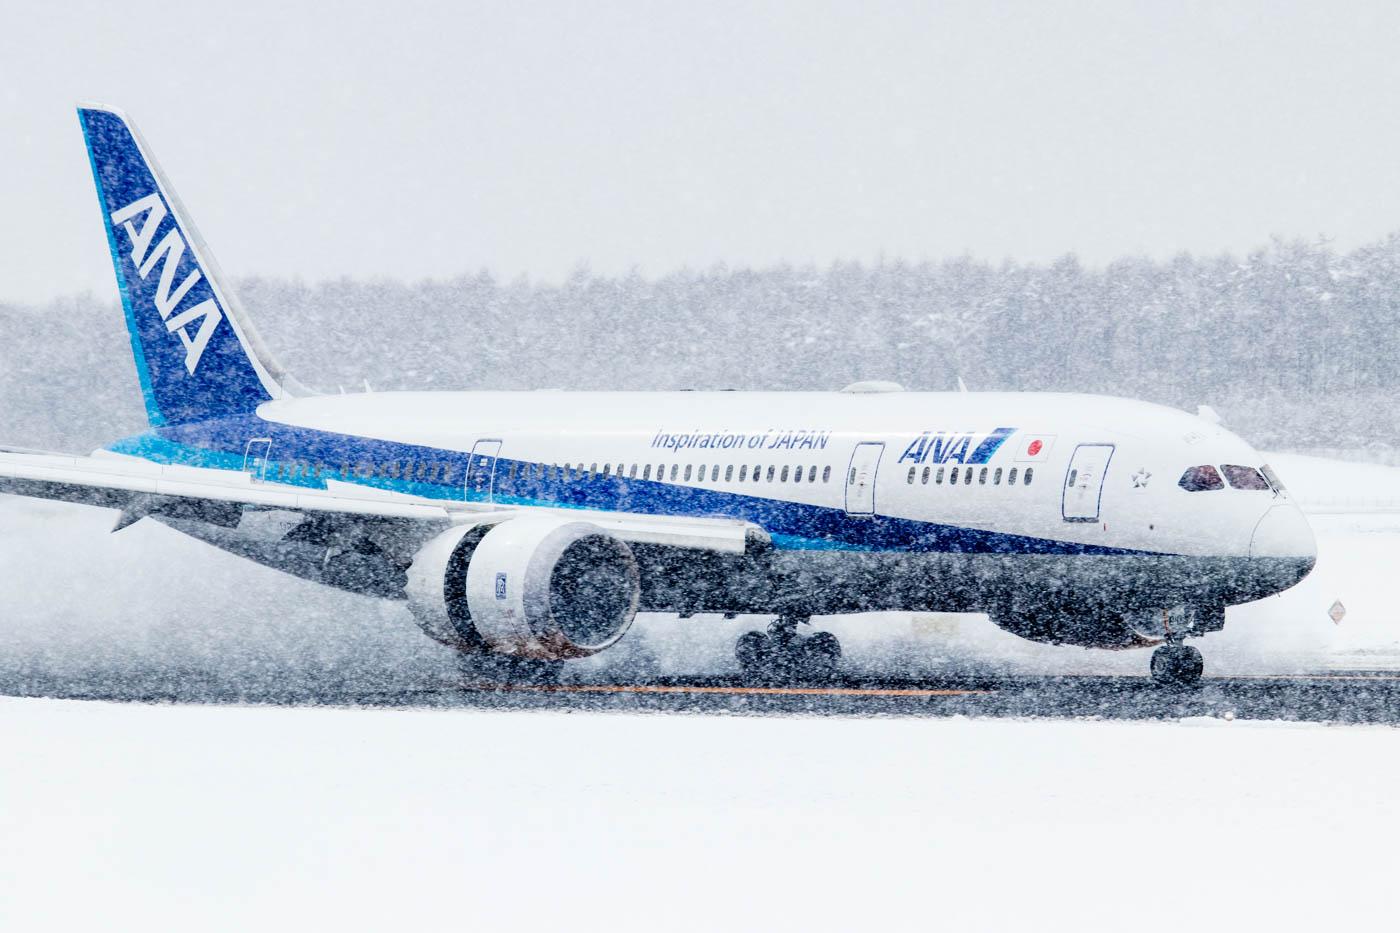 ANA 787 Landing in Snow